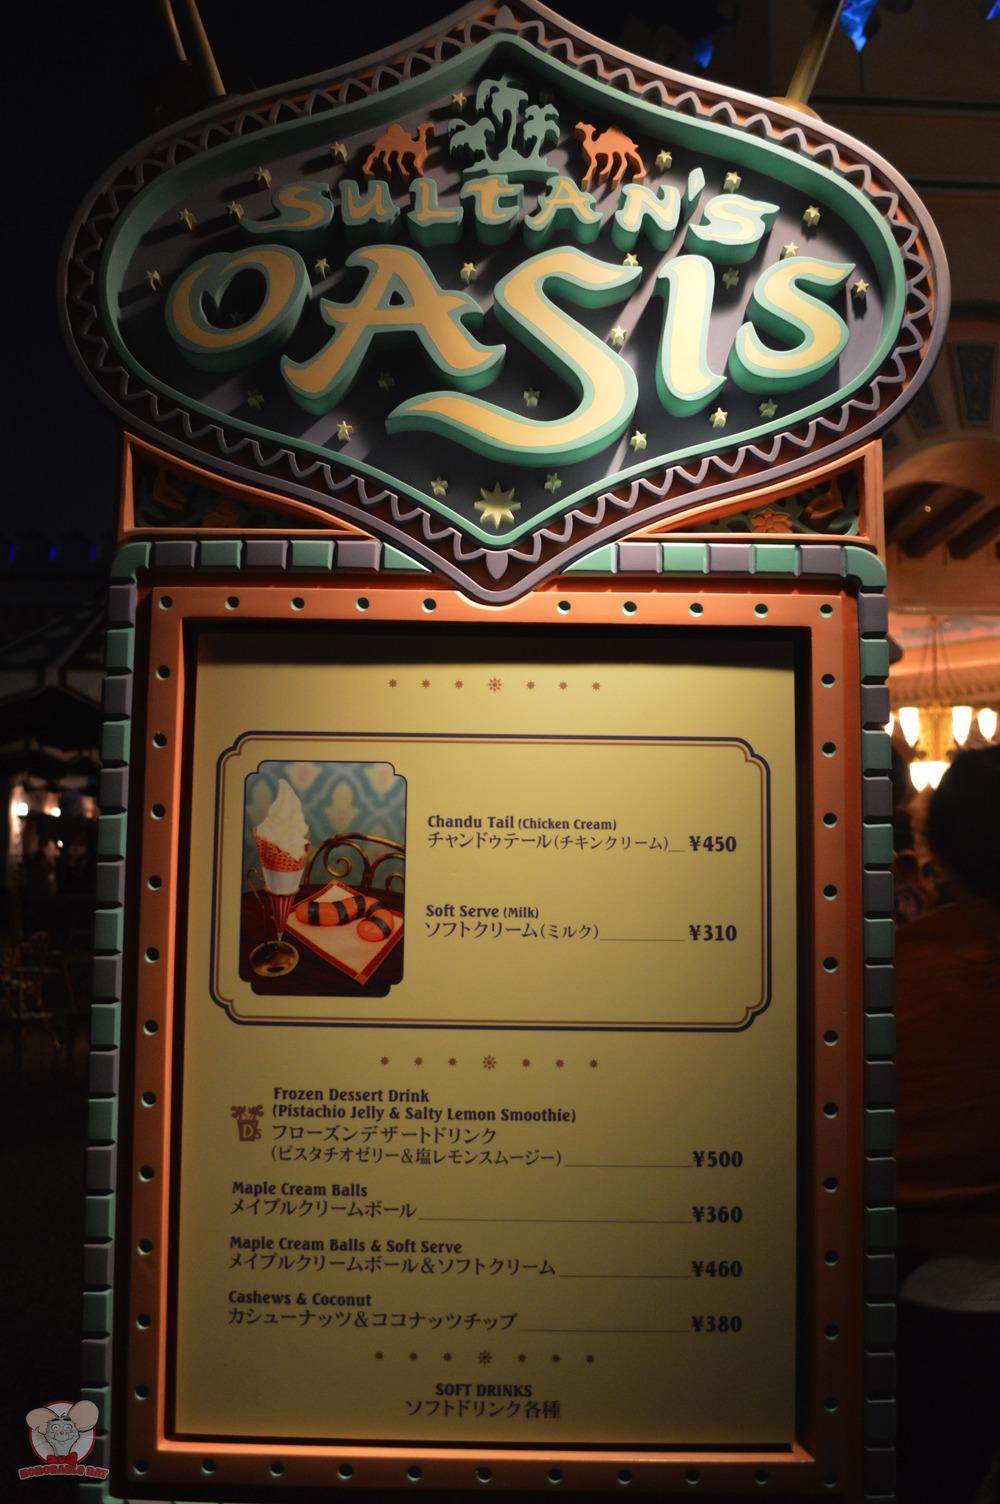 Sultan's Oasis's showcase menu